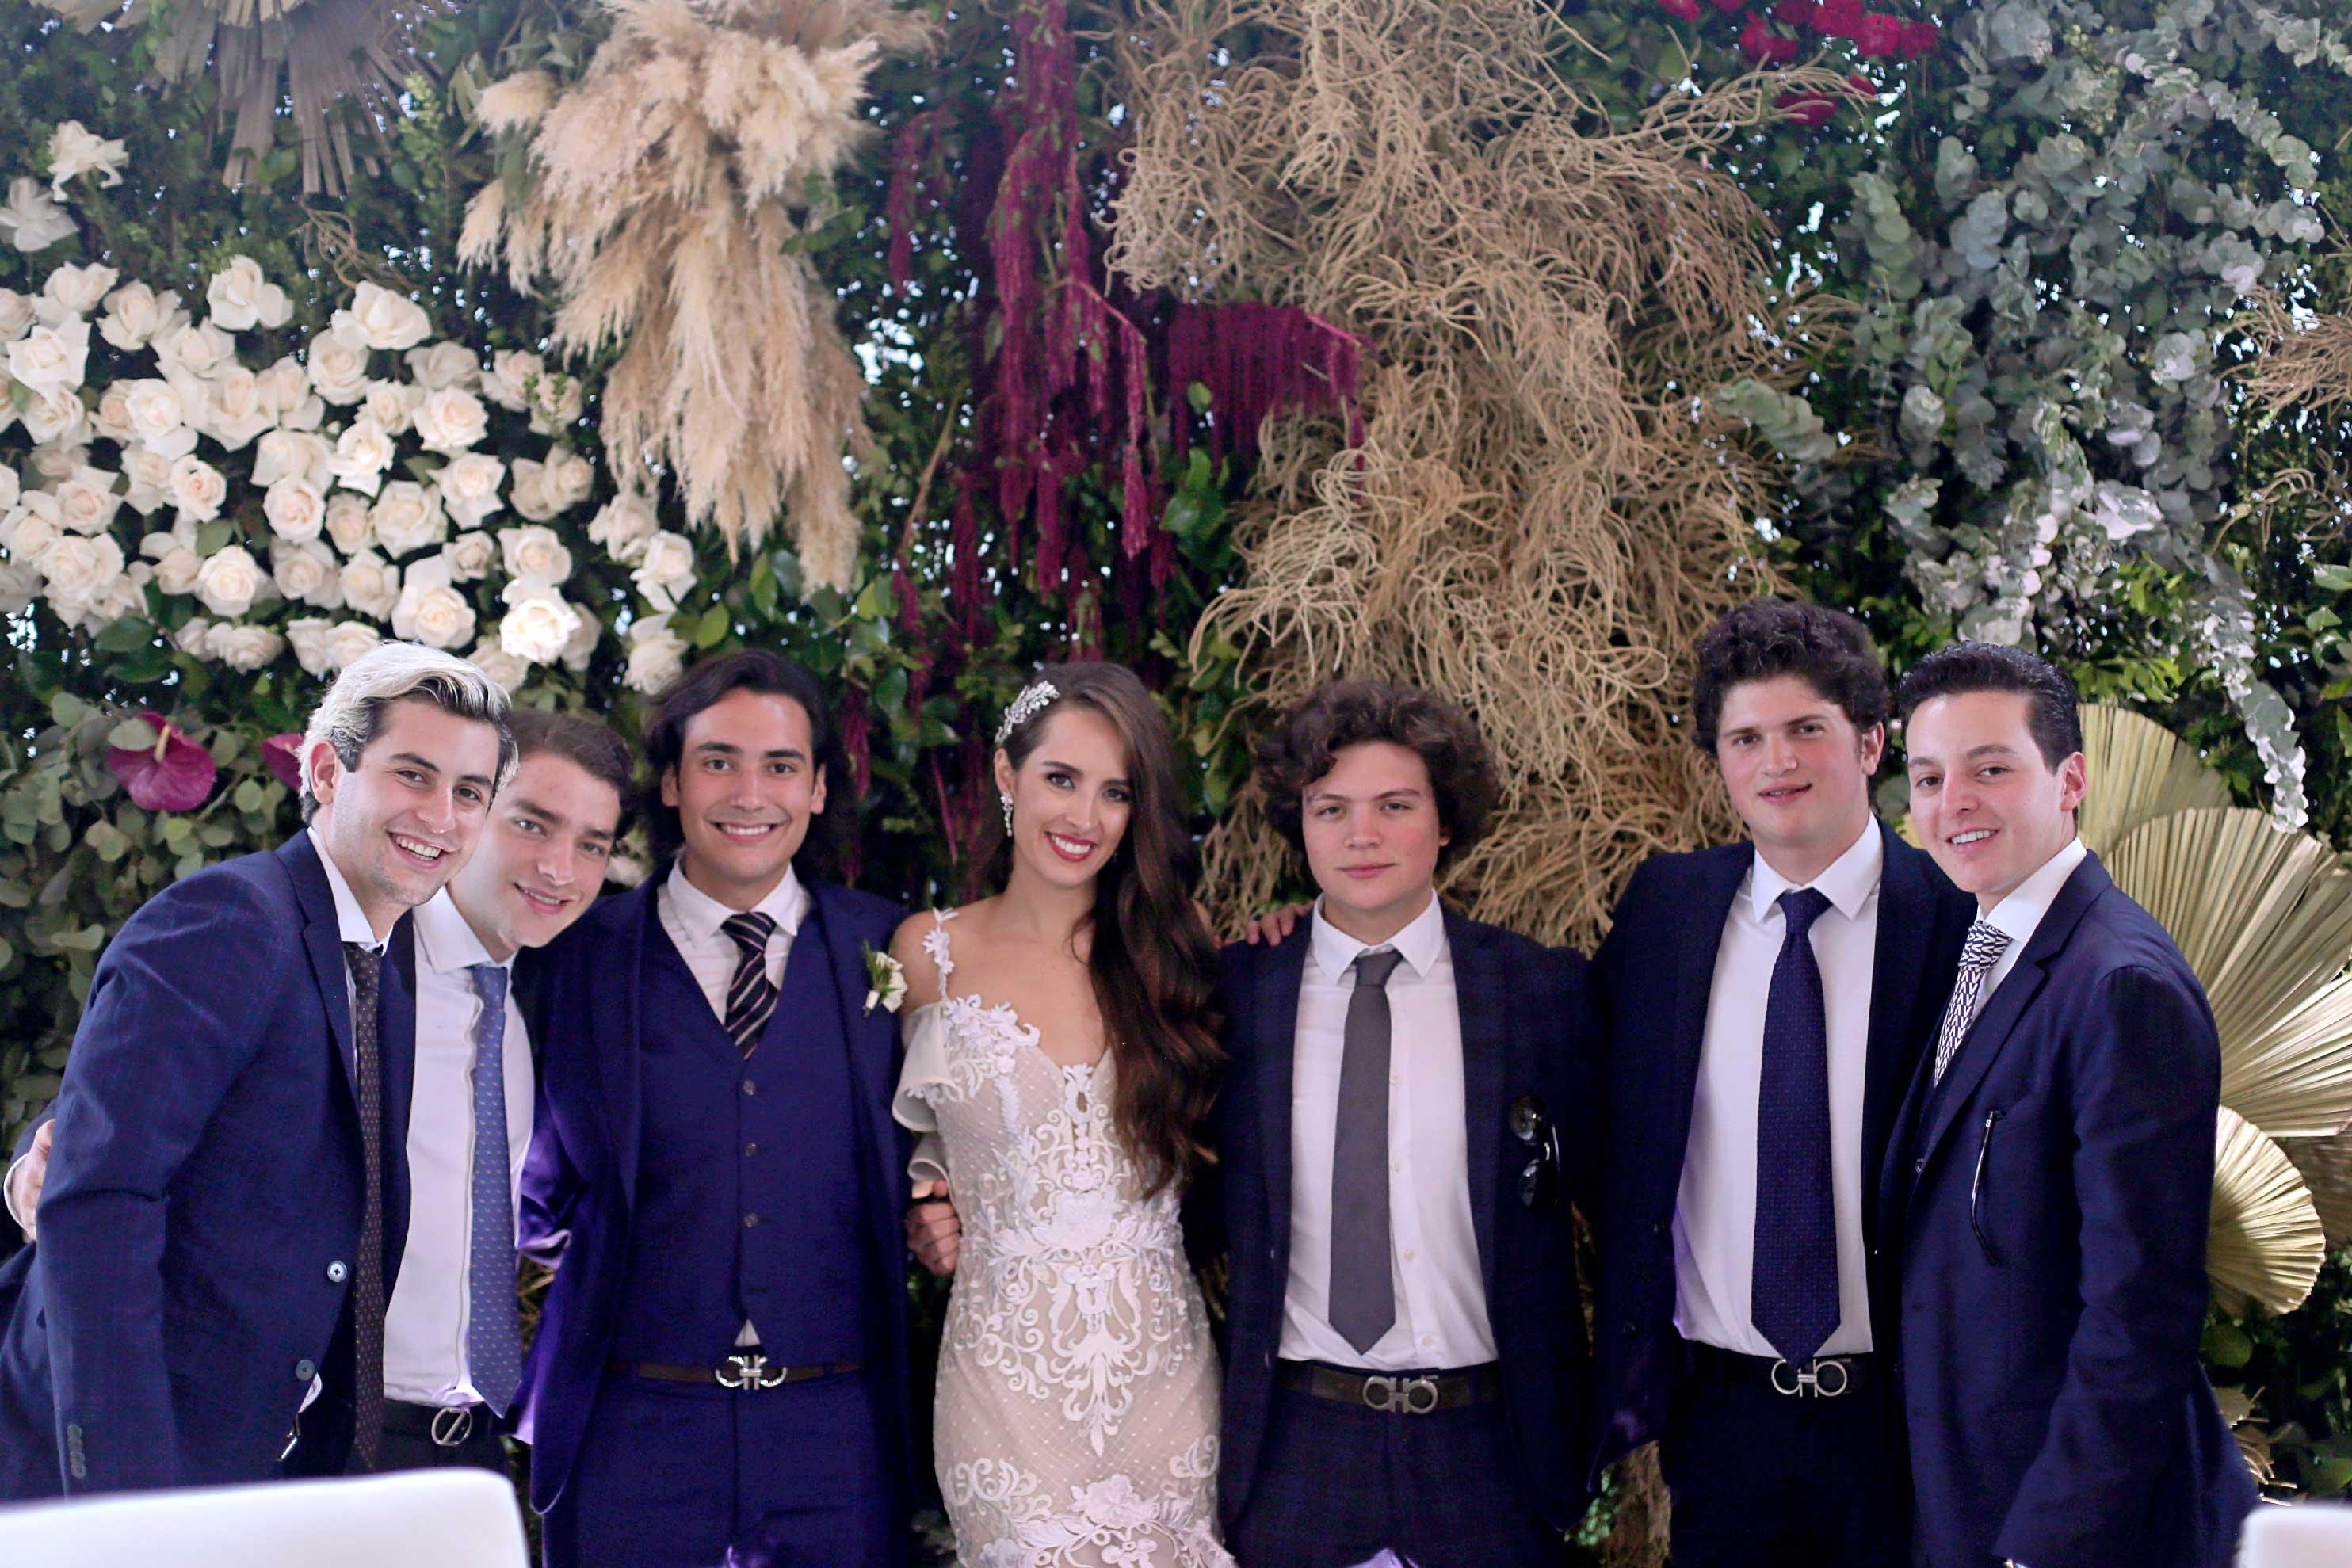 MARCO-MORENO---Jose-Pablo-Tovar,-Andres-Serio,-Salvador-González,-Gio,-Rafael-Mañón,-Patricio-Ostos,-Gabriel-El-Masri